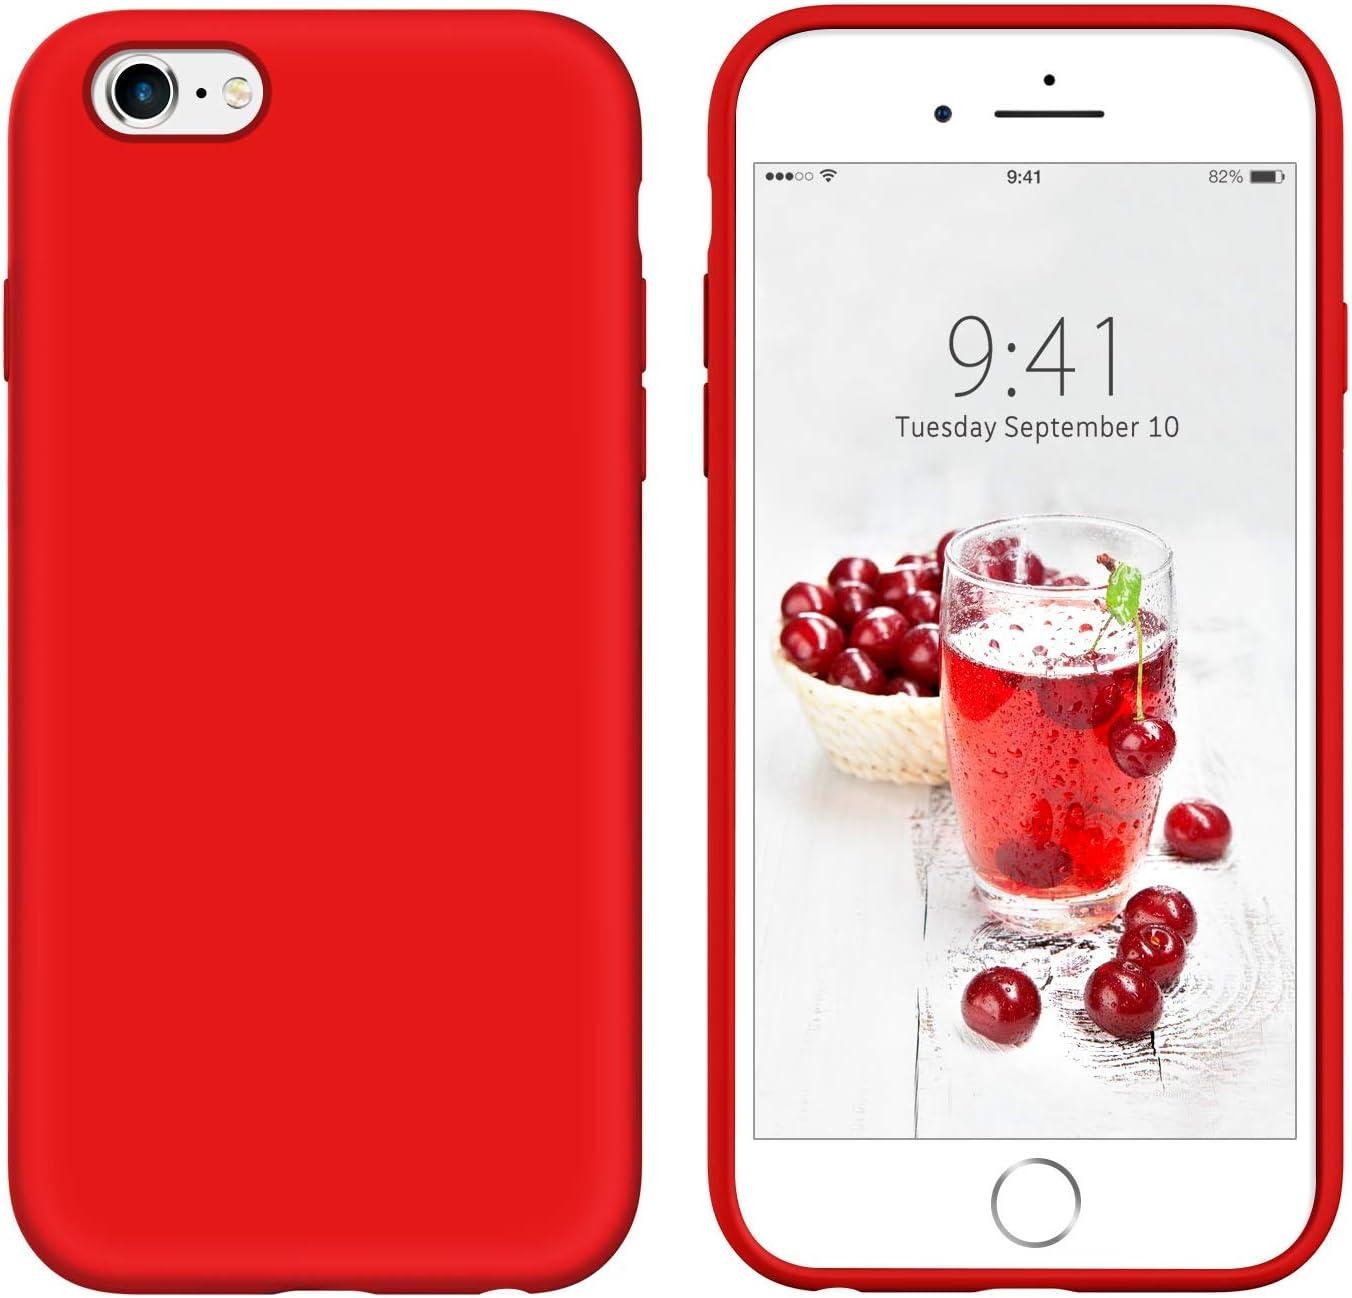 YINLAI iPhone 6S Plus Case iPhone 6 Plus Case Slim Soft Liquid Silicone Gel Rubber Cover Microfiber Cloth Hybrid Hard Back Non Slip Grip Protective ...